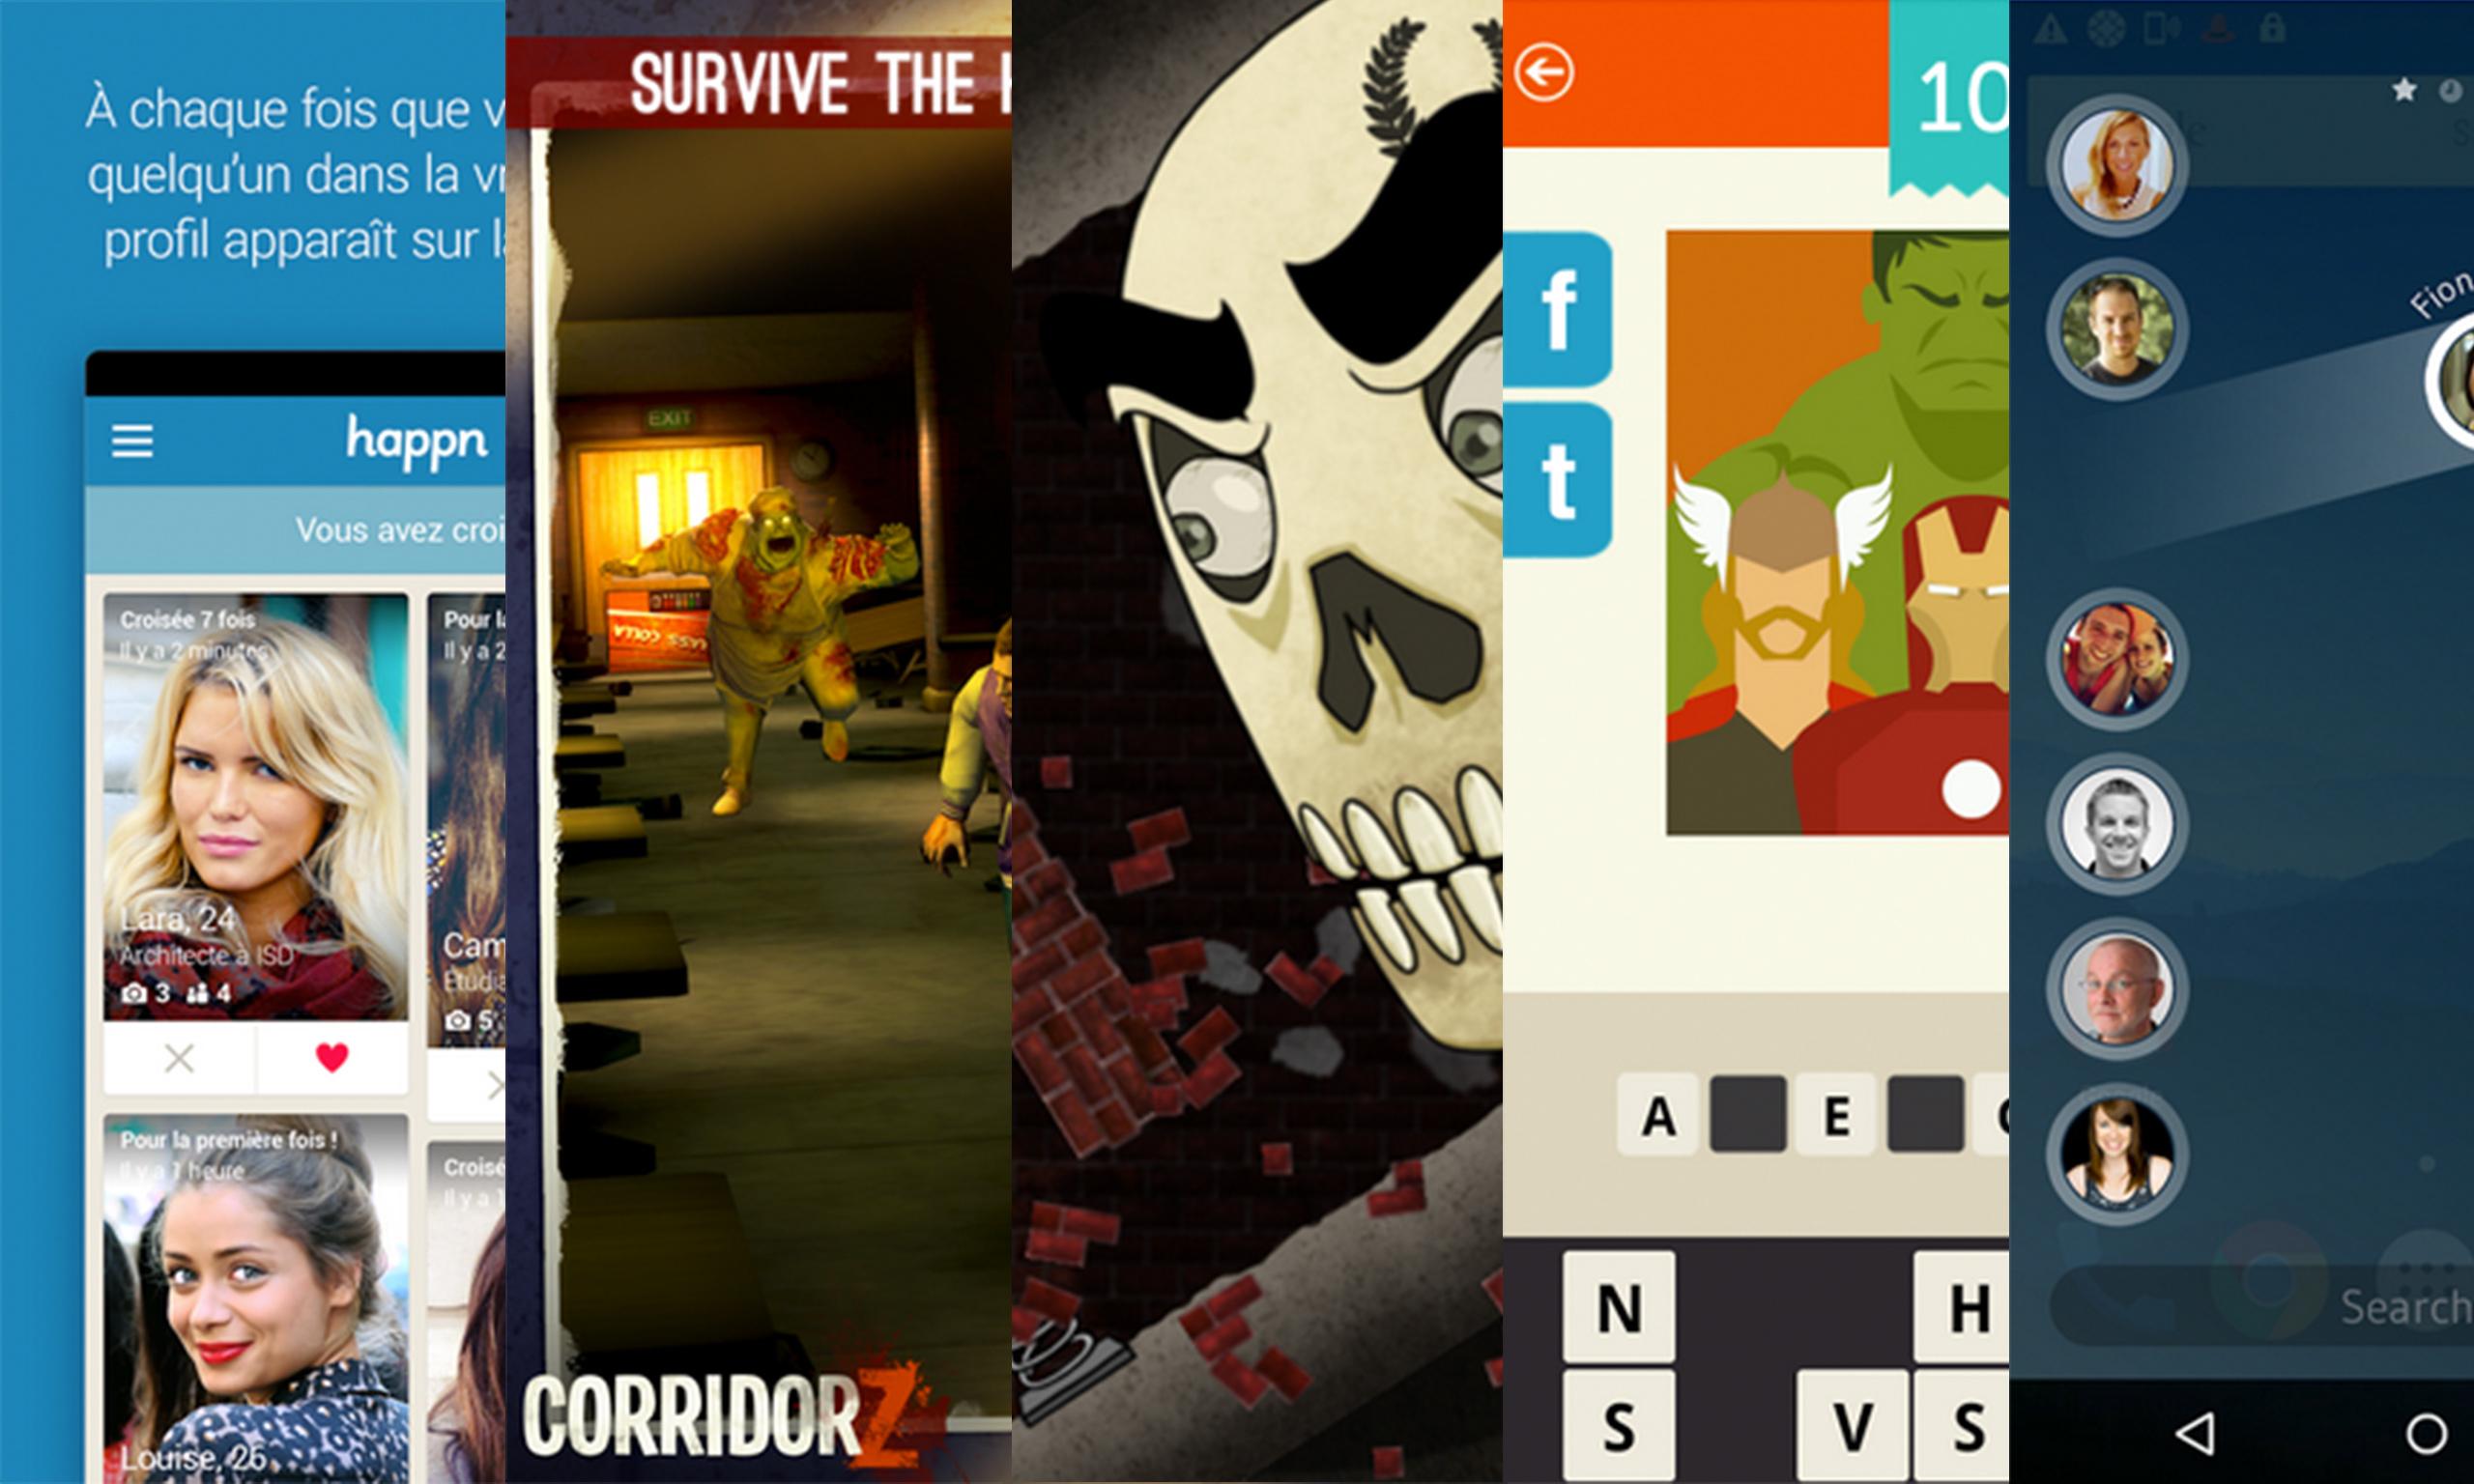 Les apps de la semaine : Happn, Corridor Z, Skullduggery!, Devinez le film ! ~ Logo Quiz, Drupe – Contacts. Your way.